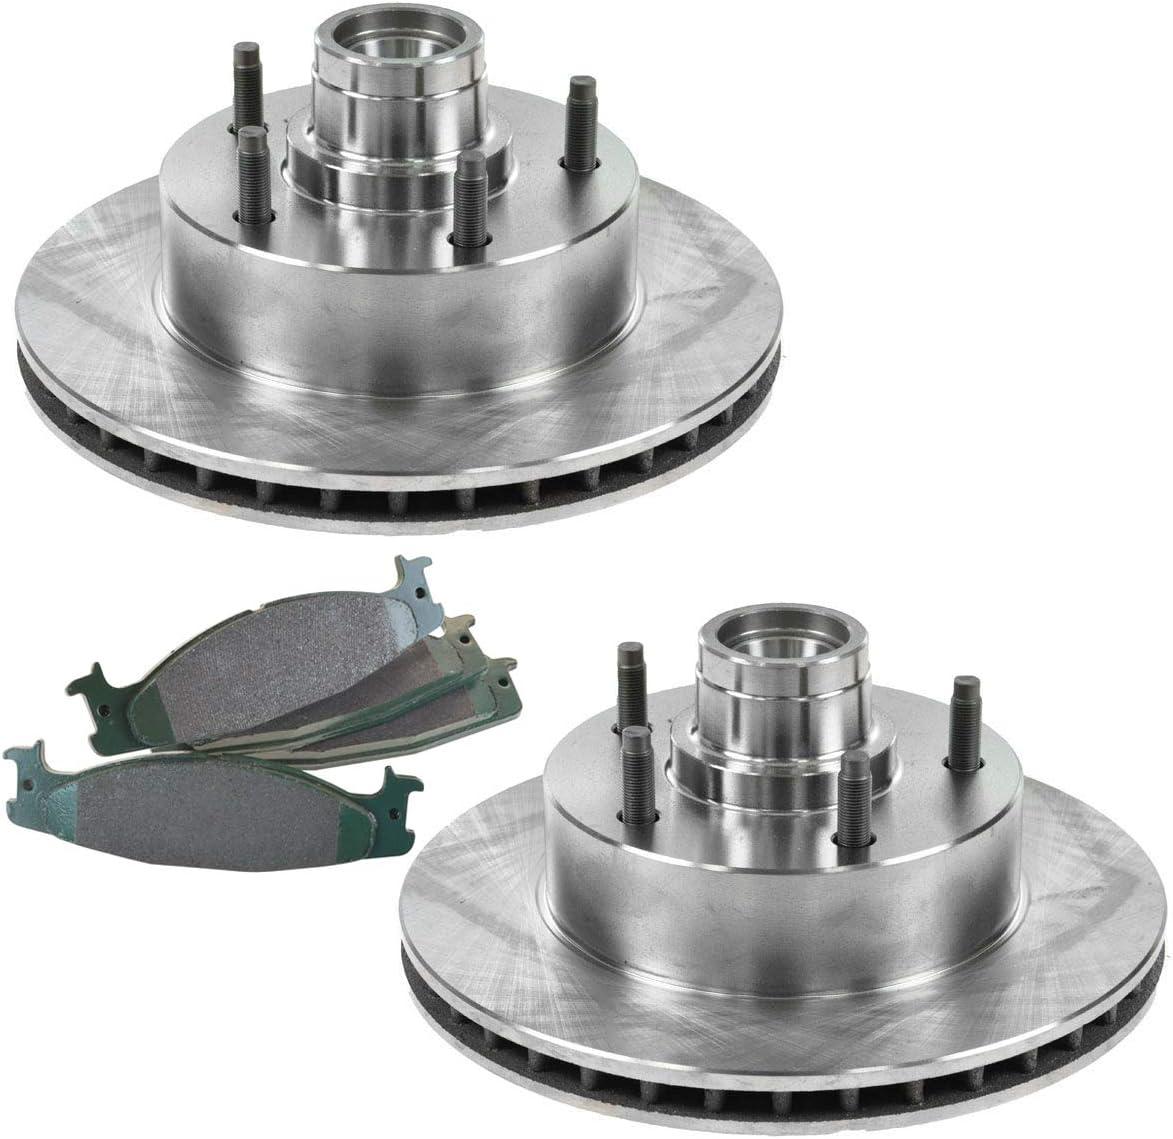 Front Sale price Premium Posi Ceramic Disc Brake 94-03 for Pads Great interest Rotor Kit